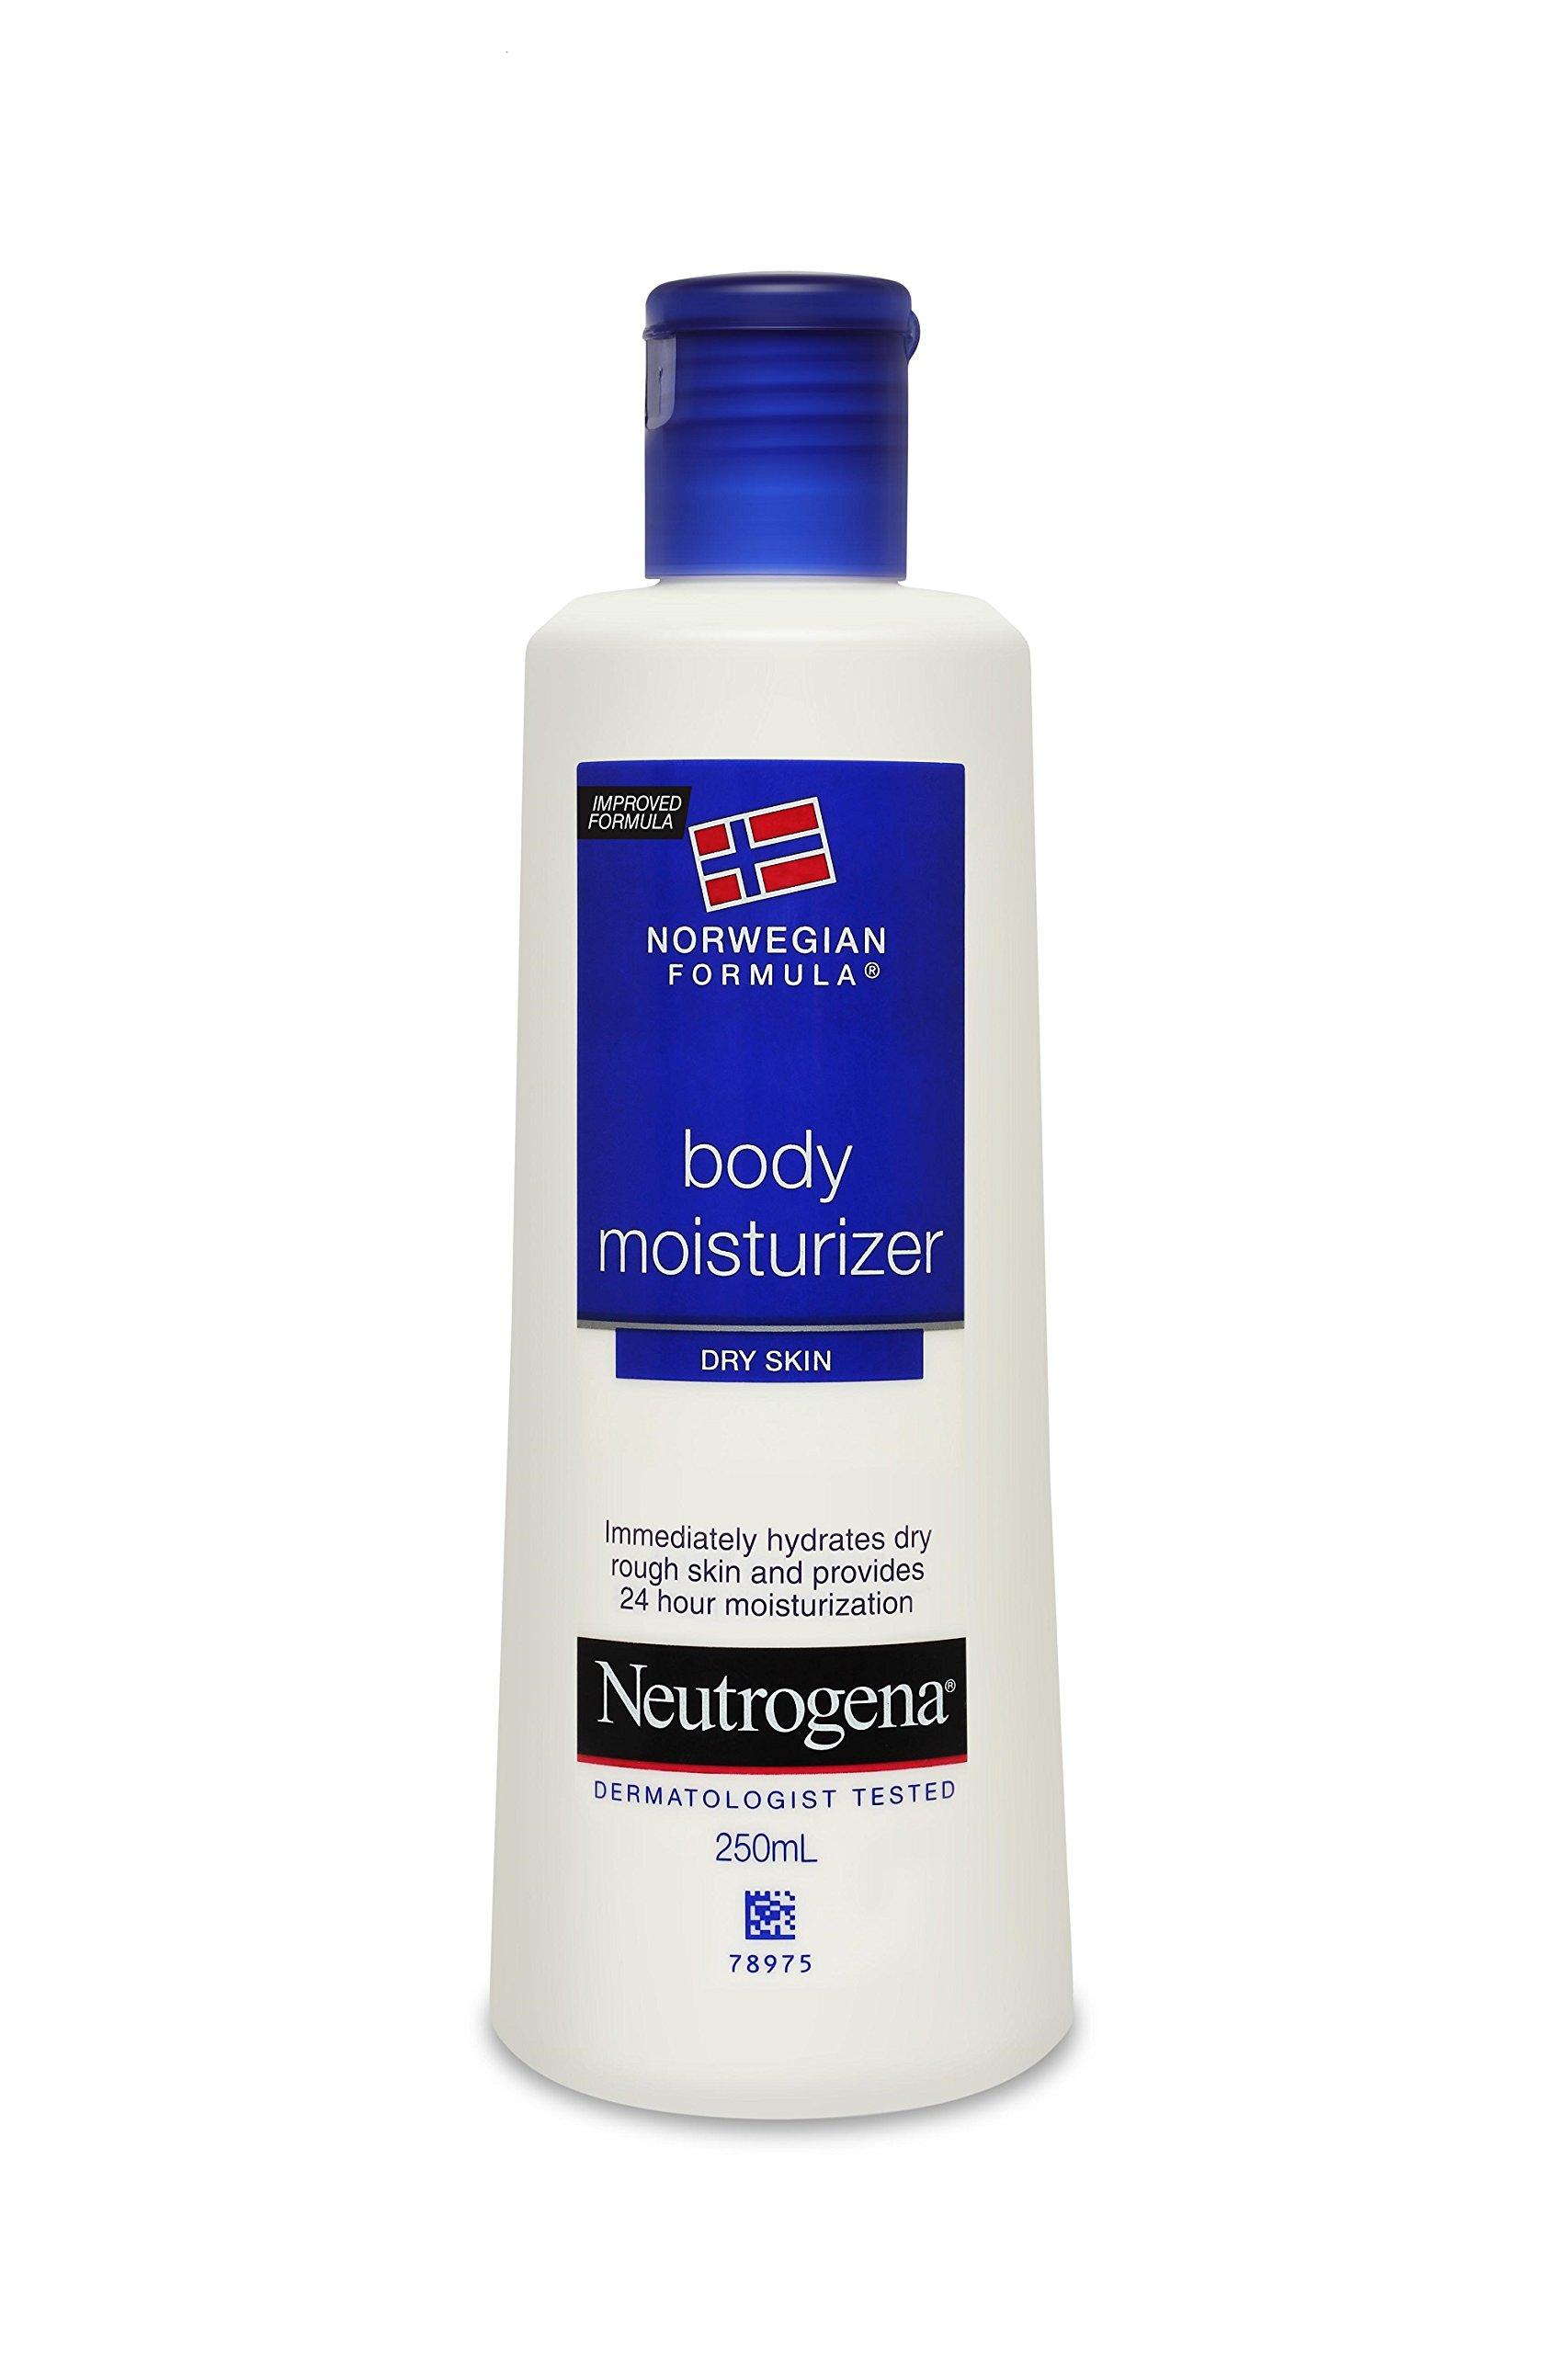 Neutrogena Norwegian Formula Body Moisturizer (for Dry Skin), 250ml product image